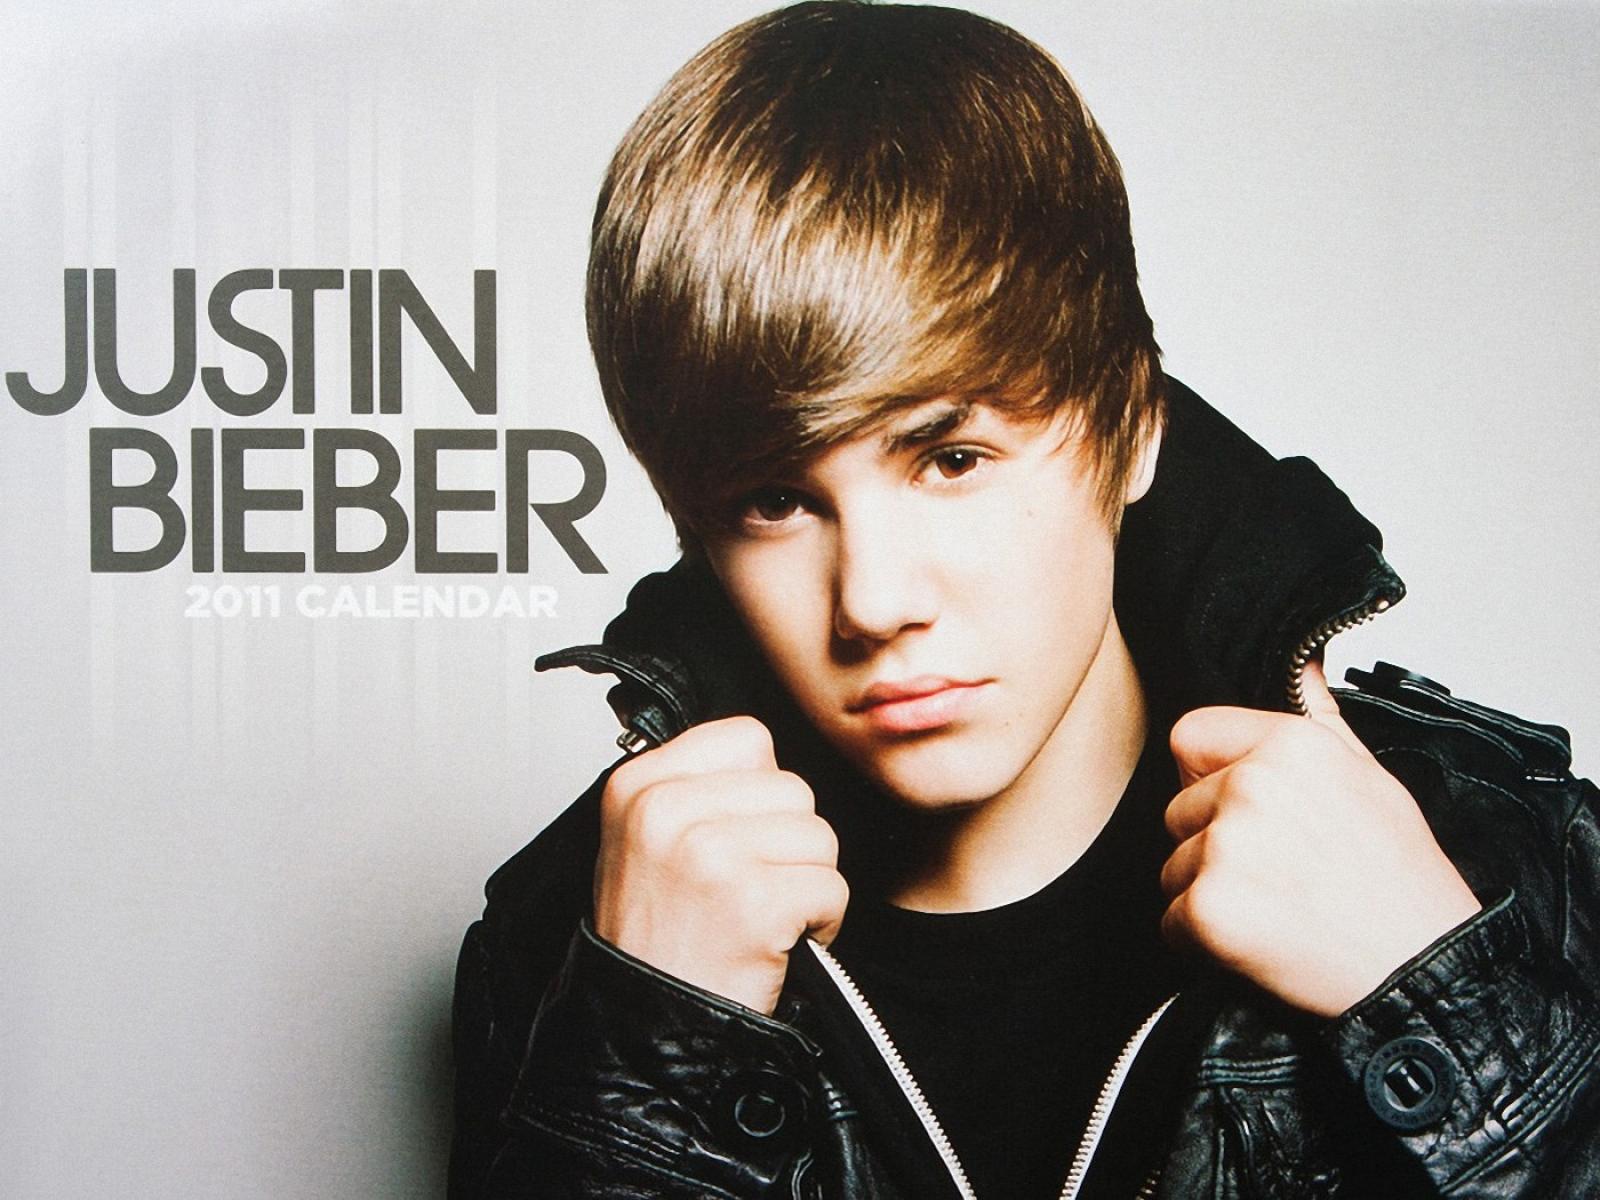 Wallpaper download justin bieber - Wallpaper Download Justin Bieber 7